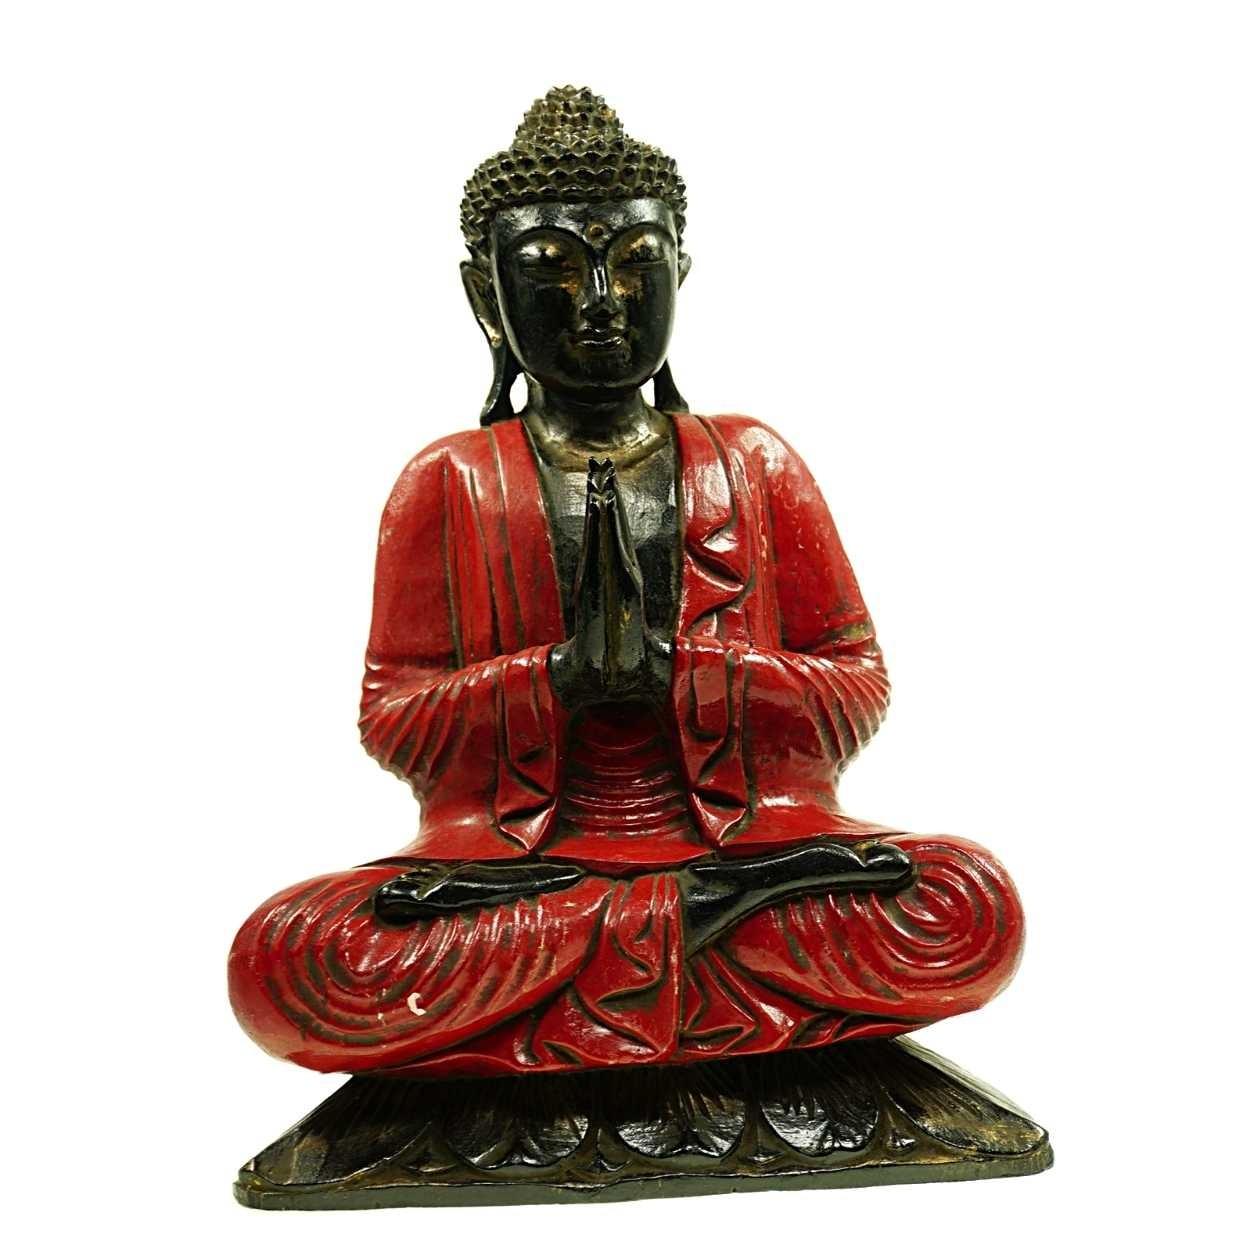 Buddha Lamruam Rot 50 cm Suarholz Unikat